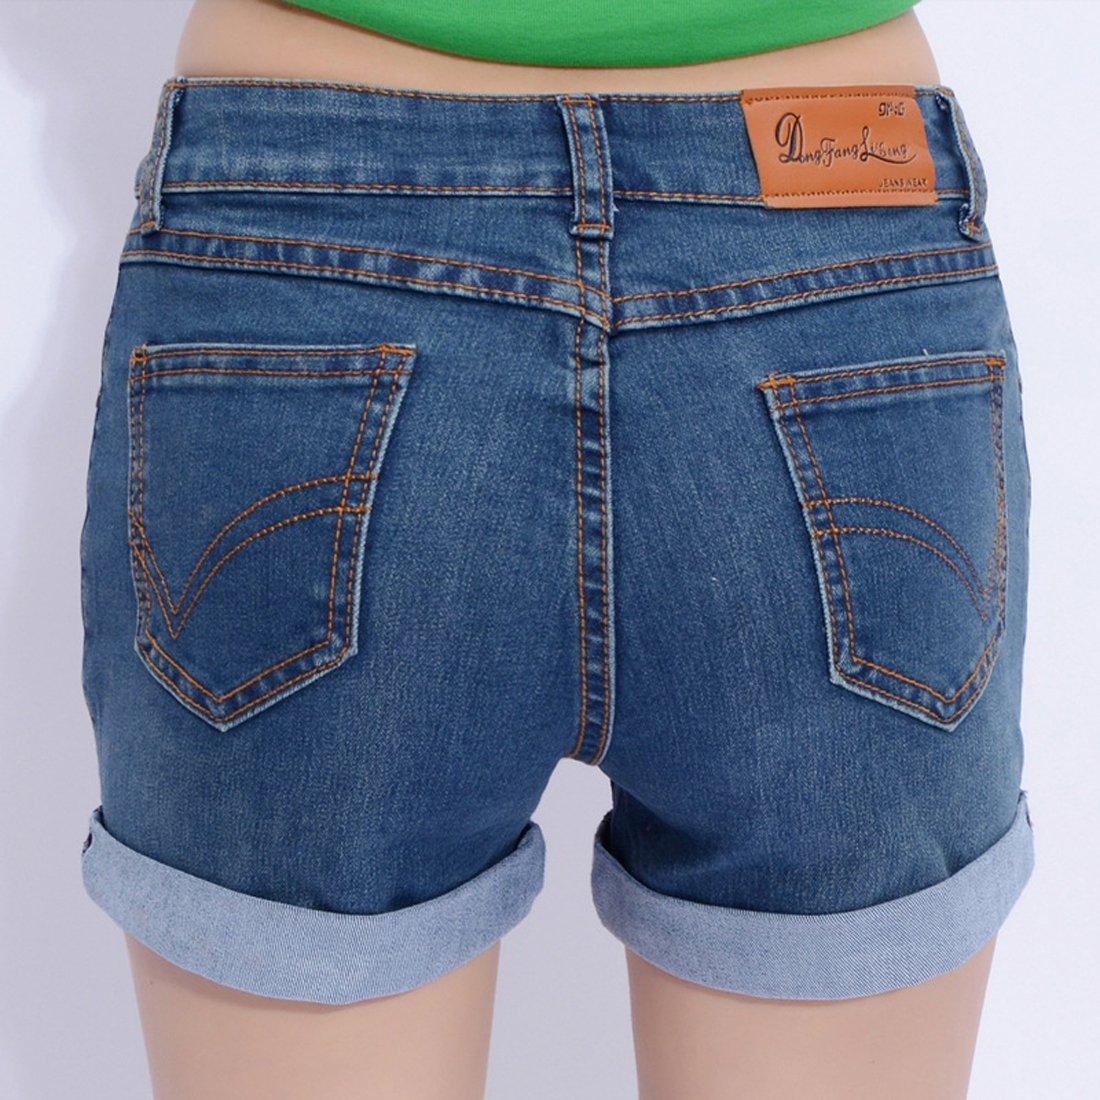 Chouyatou Women's Basic Stretched Mid-Rise Turn-up Cratched Denim Shorts (Large, Blue) by Chouyatou (Image #3)